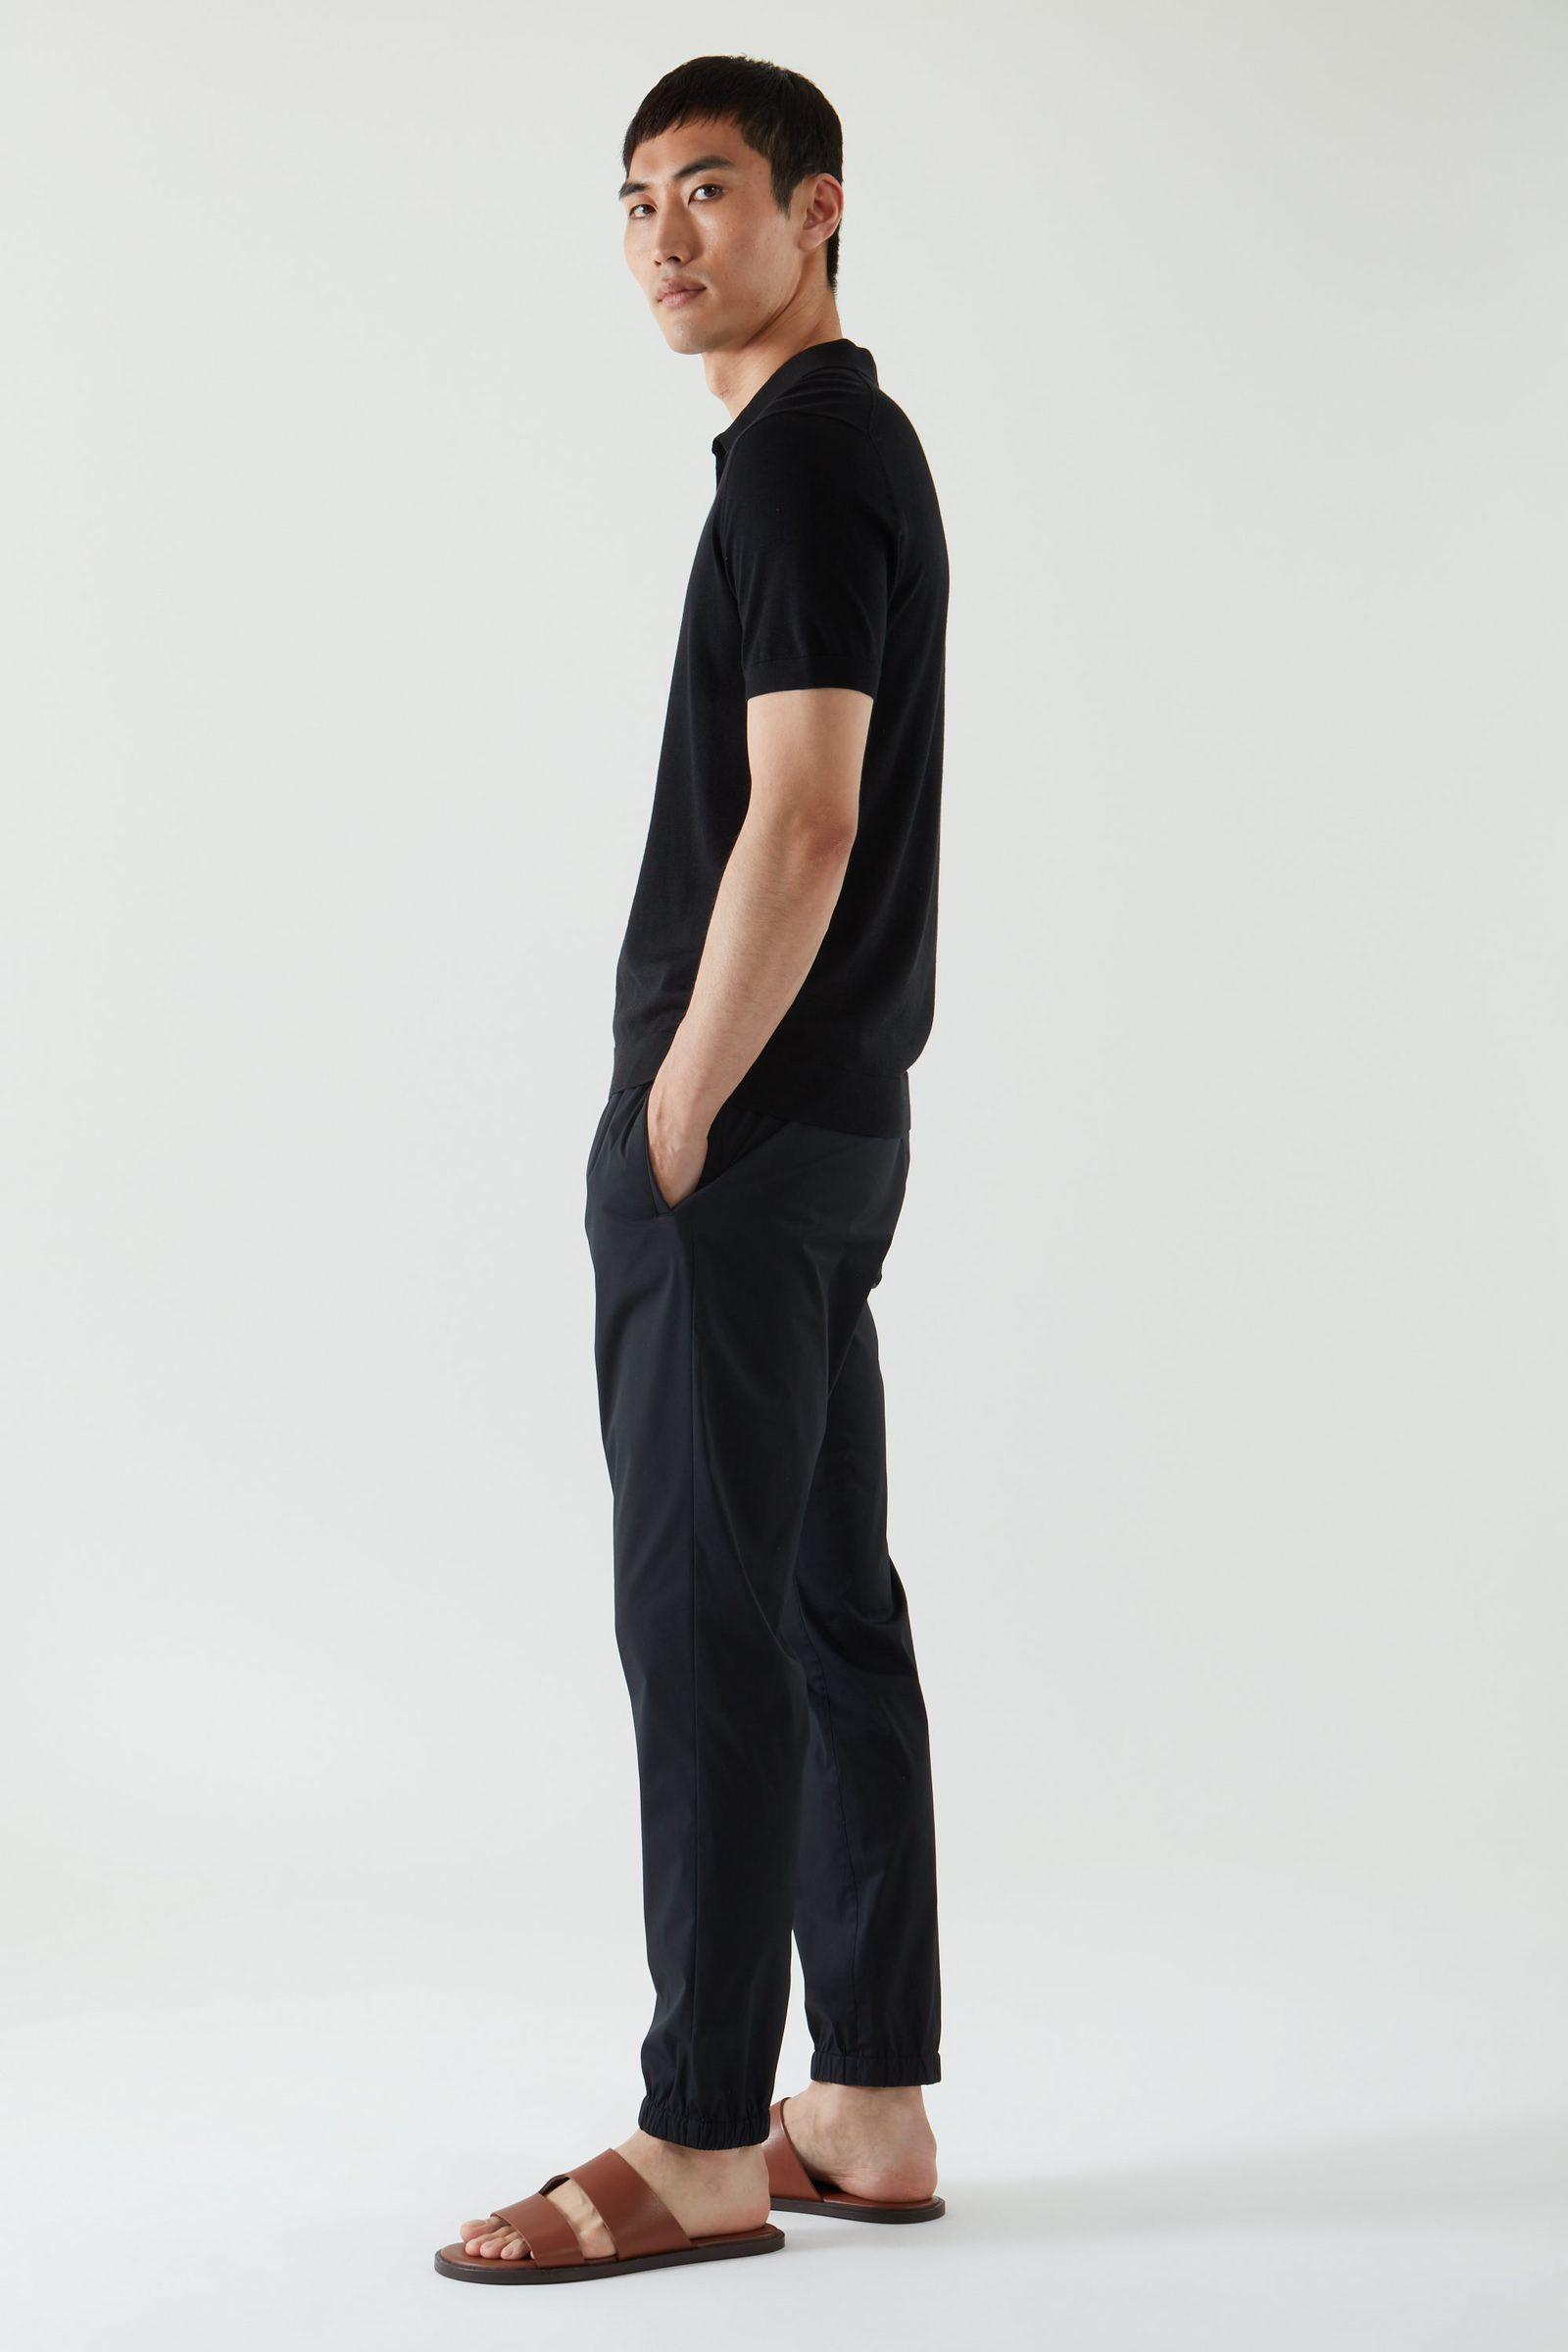 COS 실크 코튼 폴로 셔츠의 블랙컬러 모델컷입니다.